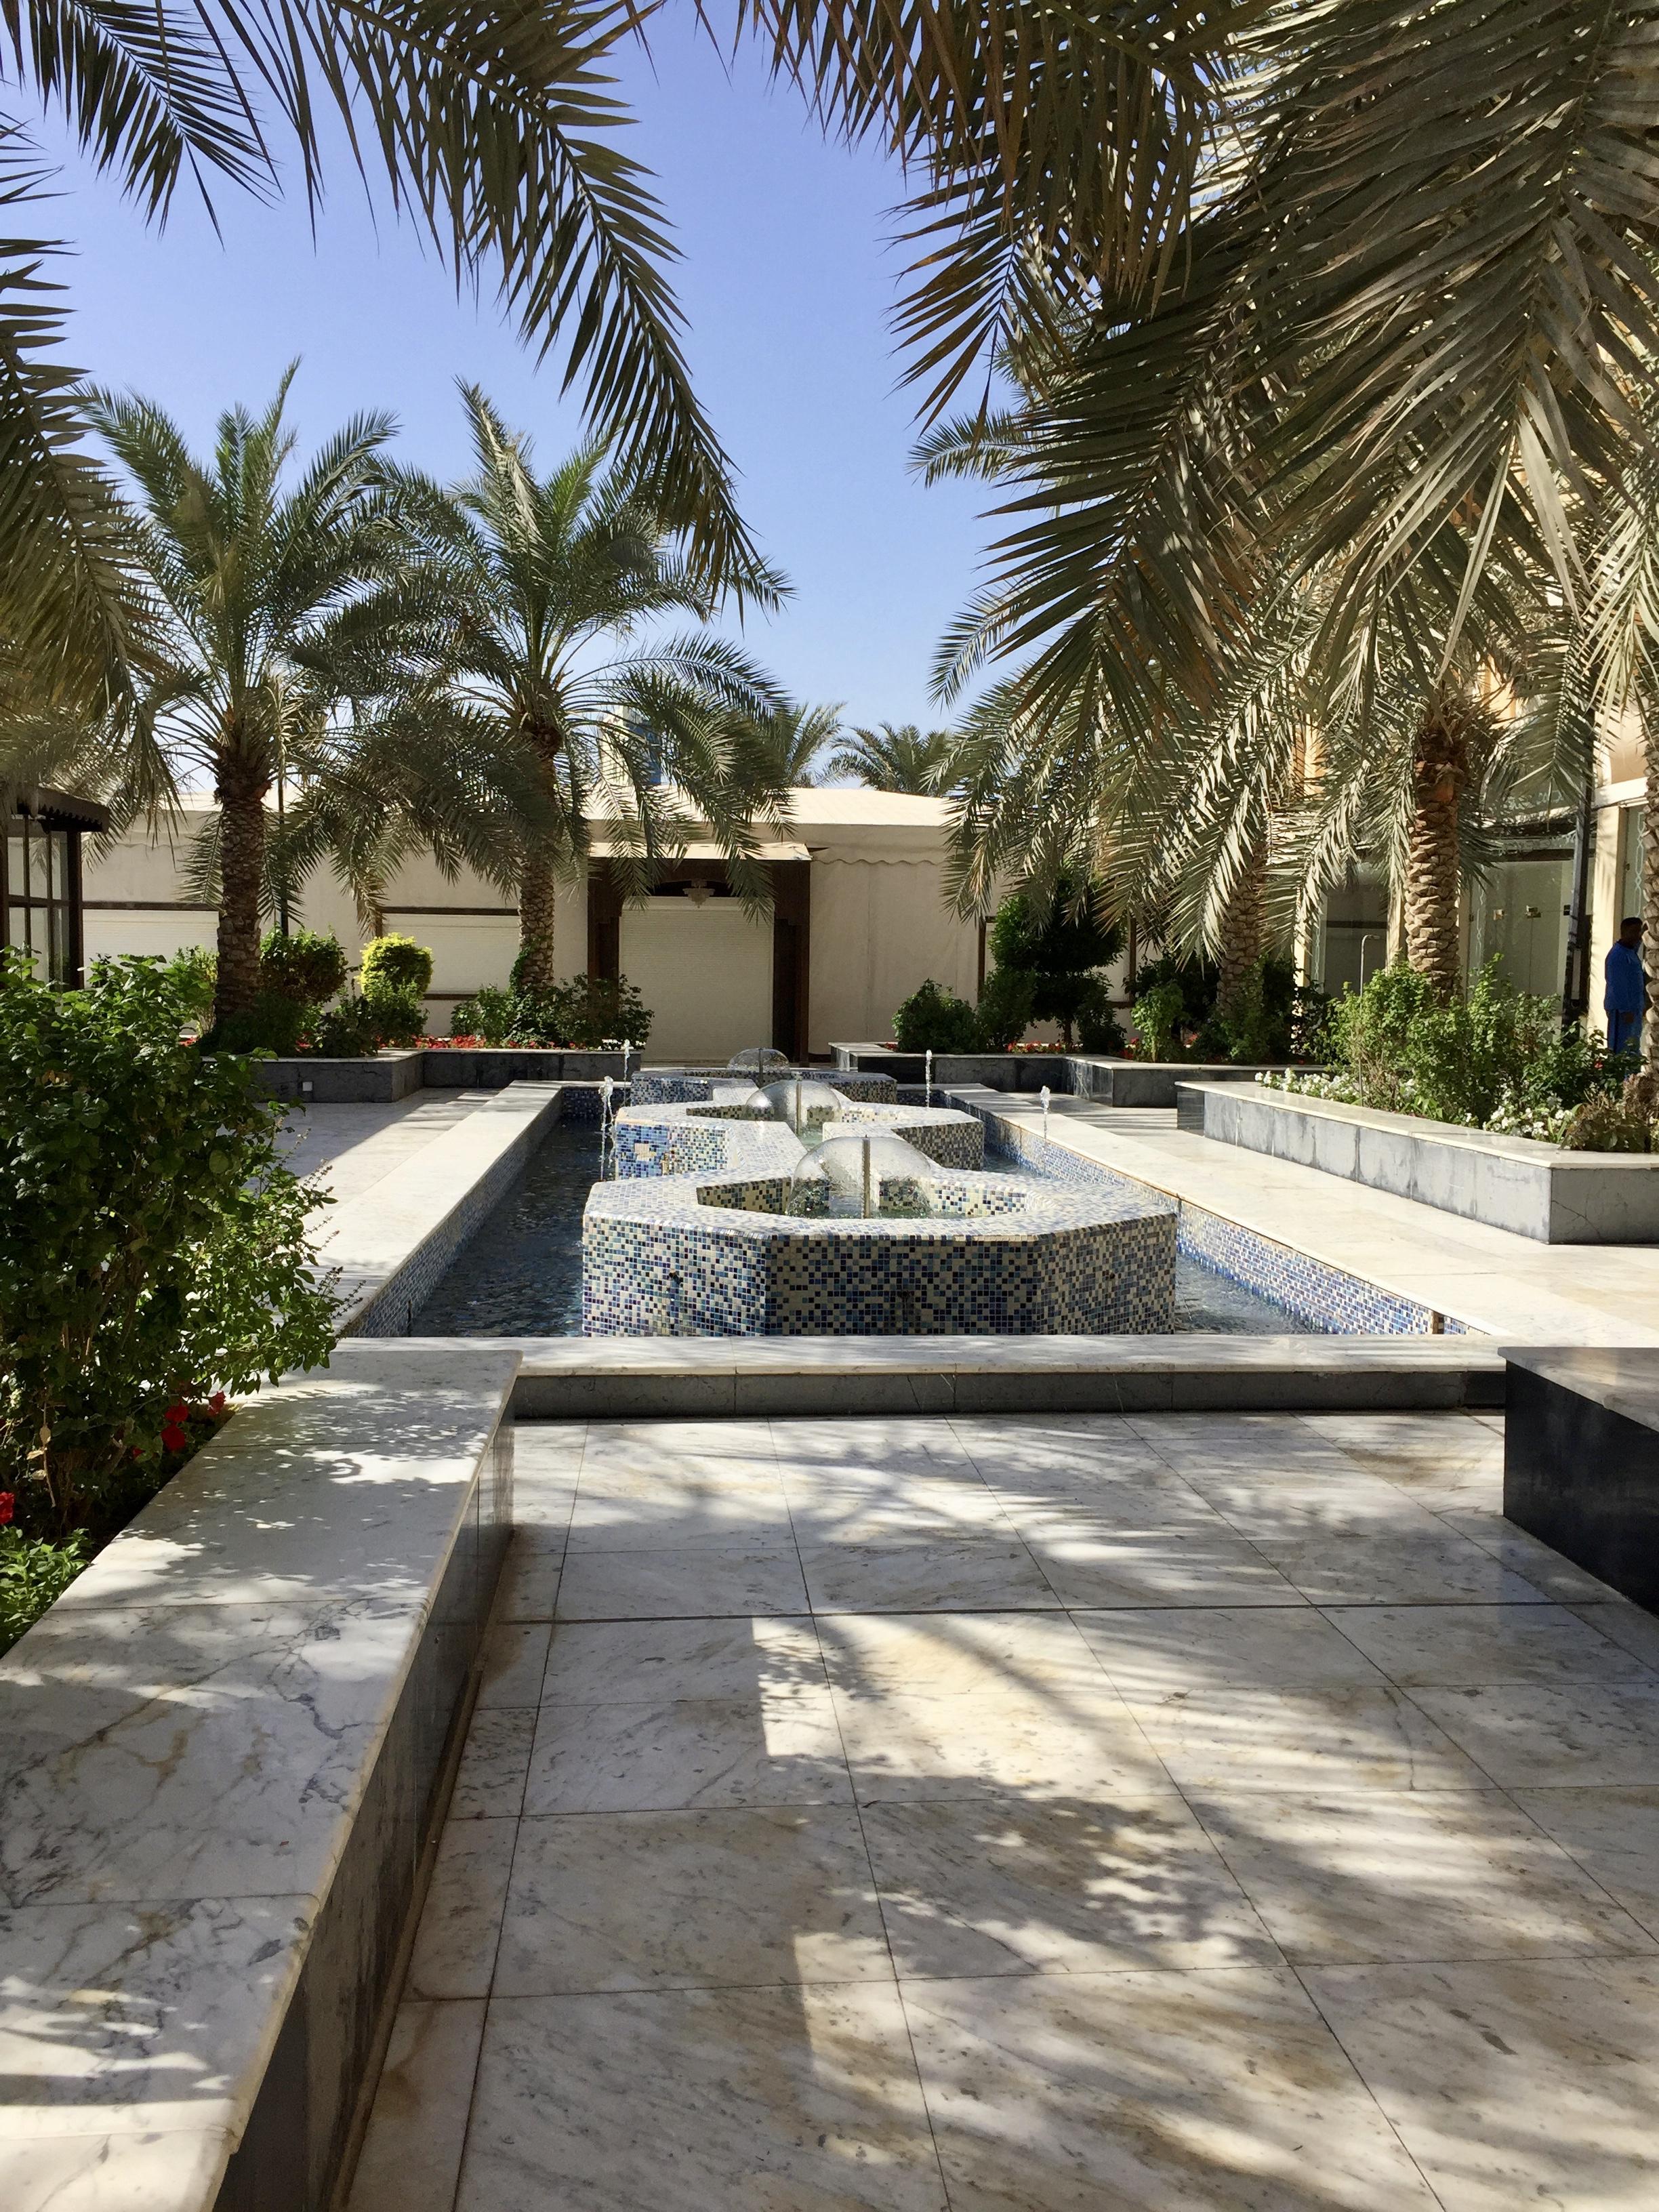 Kuwait City, Kuwait - Grand Mosque of Kuwait - Fountain